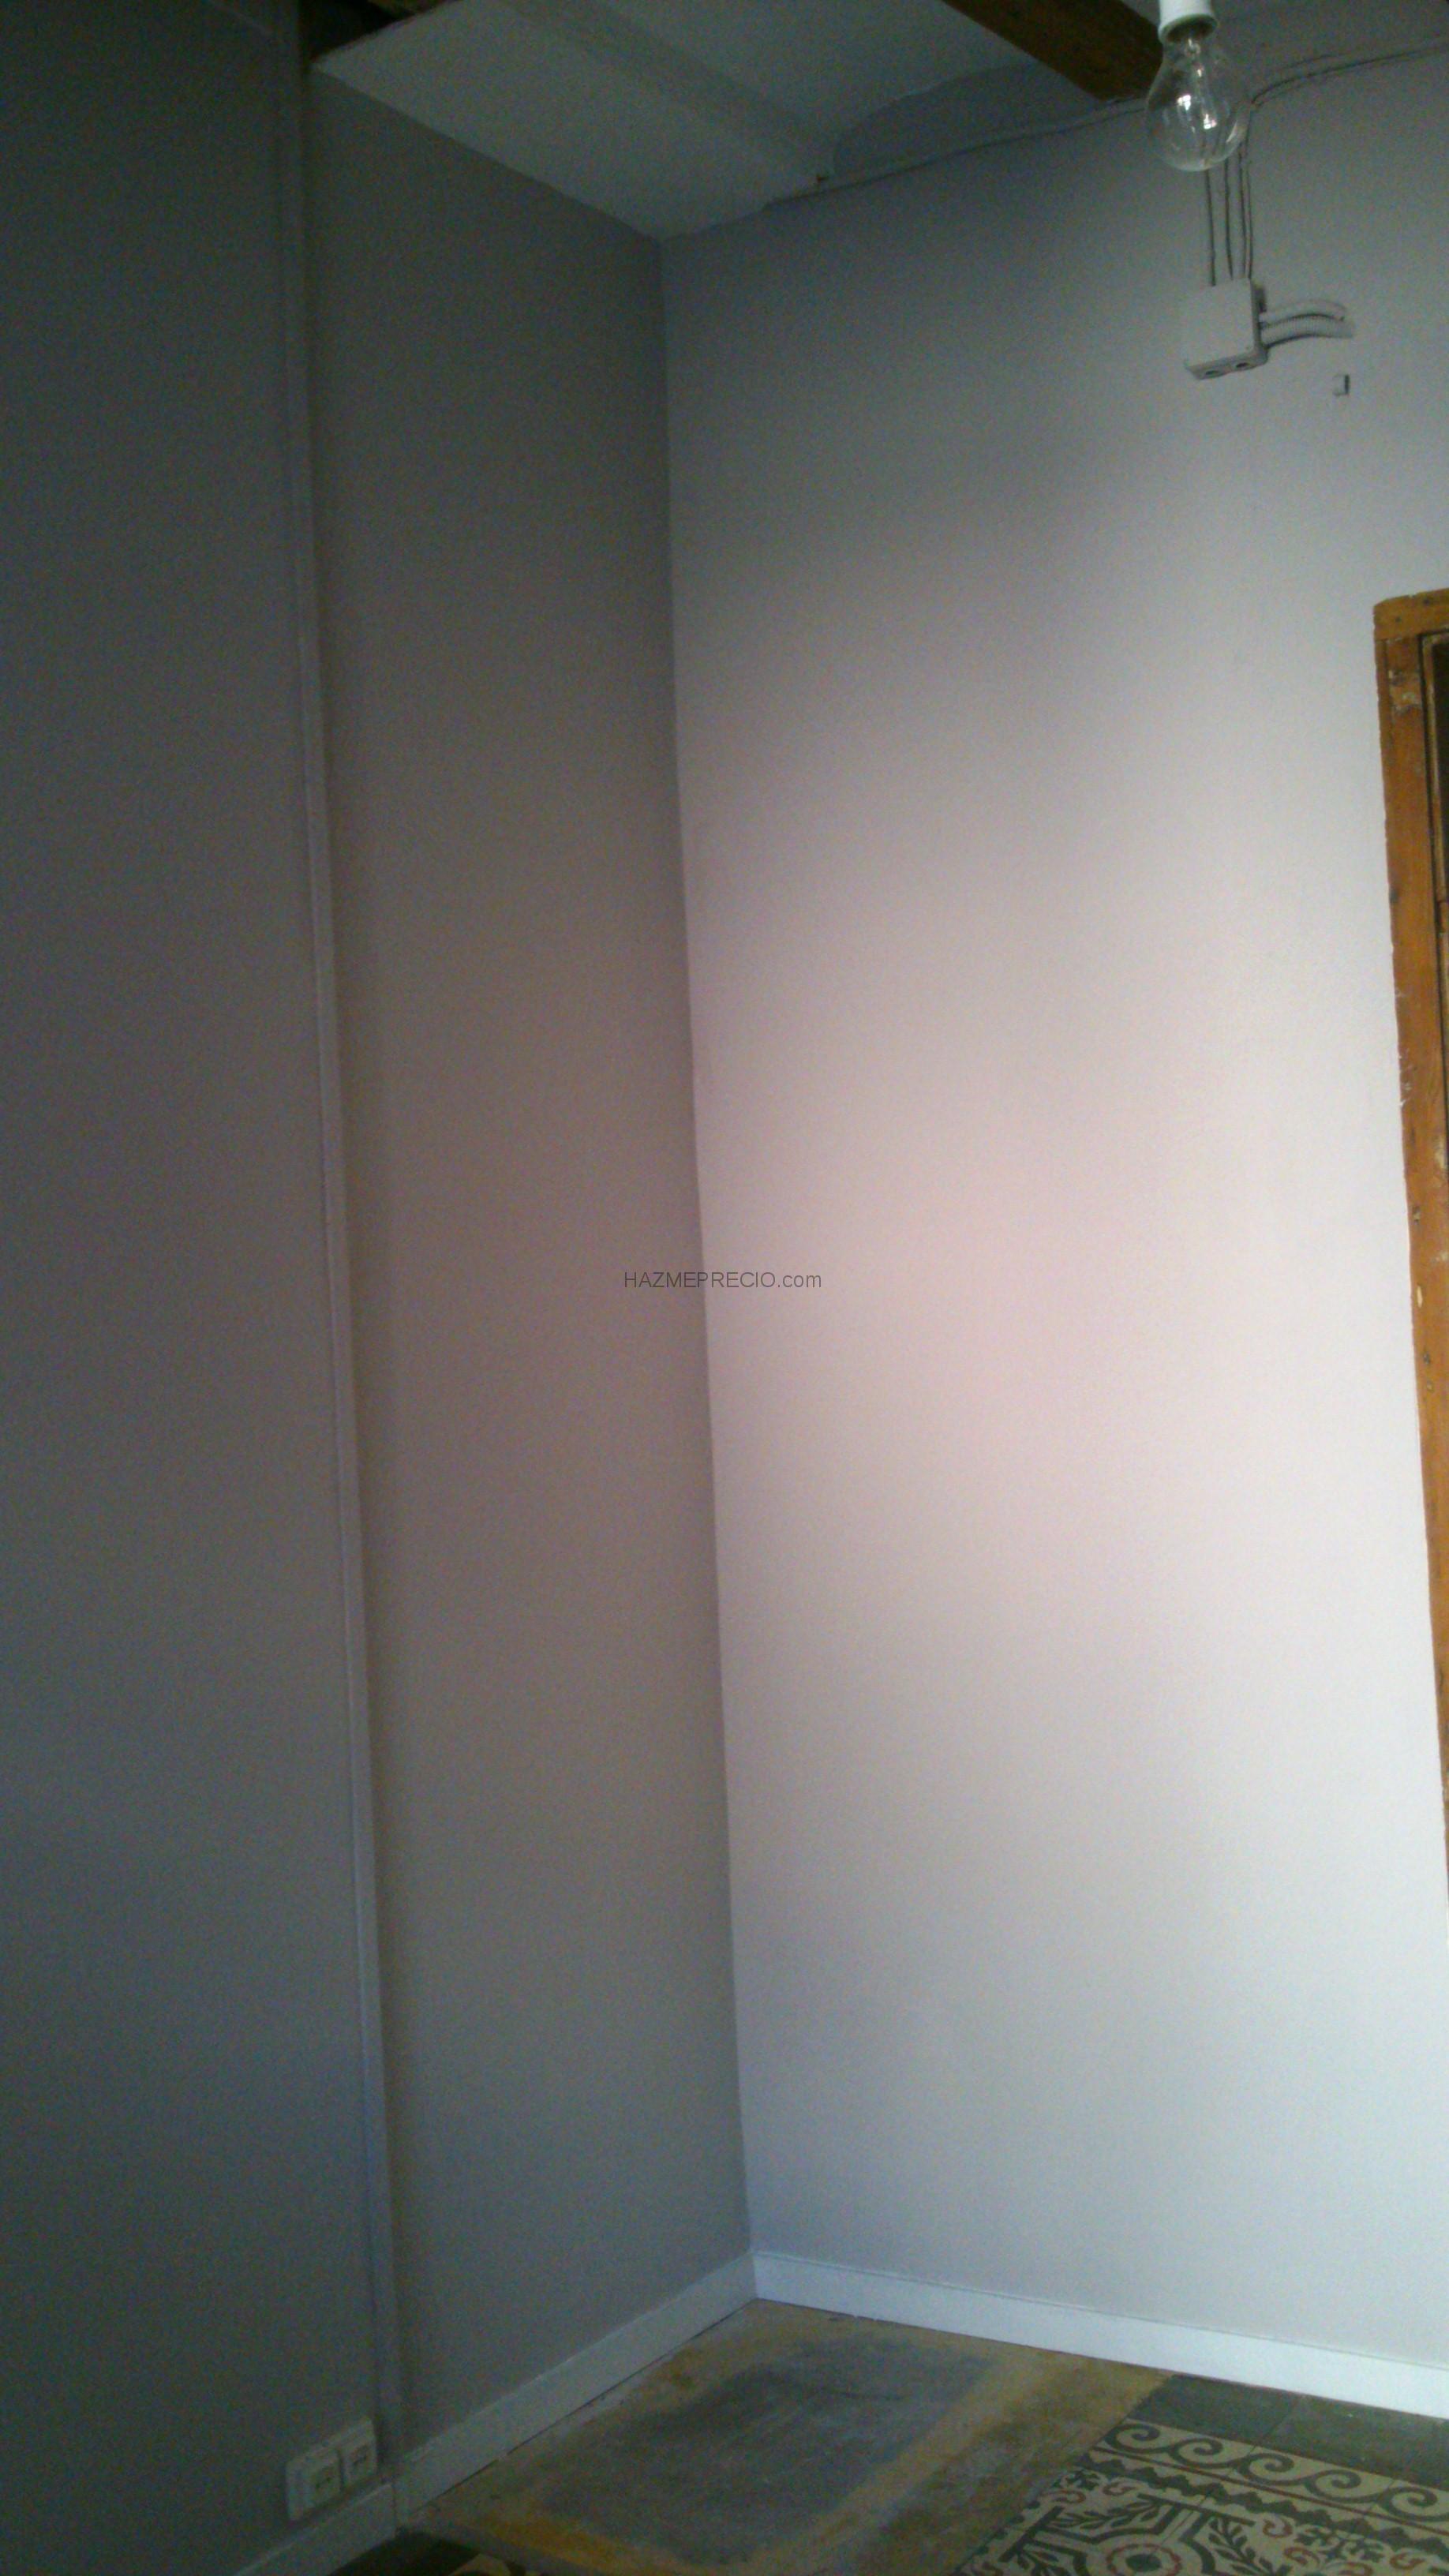 Pinturas jordi 08015 barcelona barcelona - Precio pintar piso barcelona ...